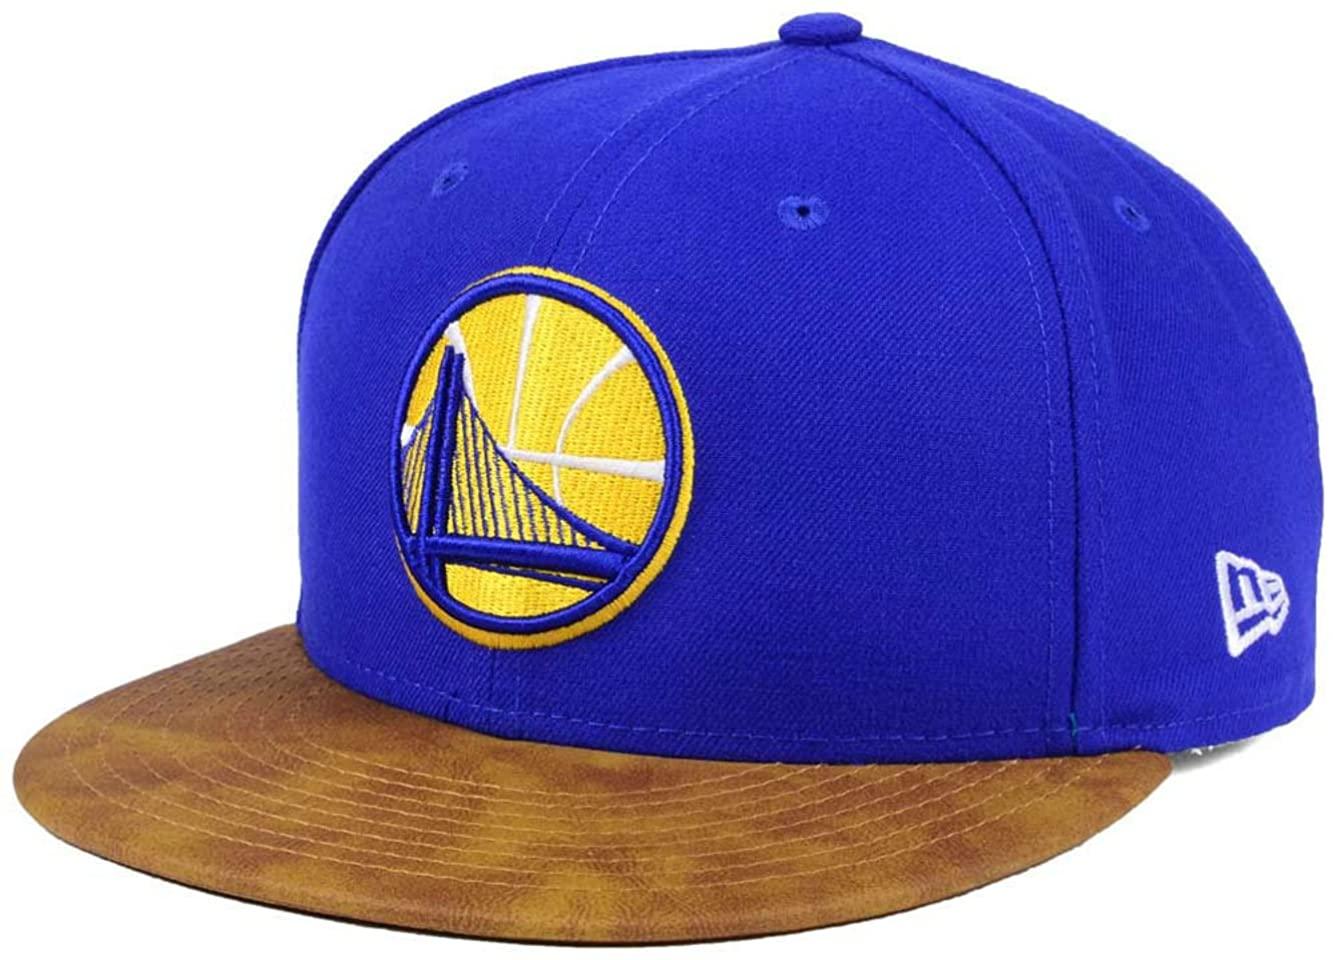 Golden State Warriors Butter Snapback Hat/Cap - Team Colors